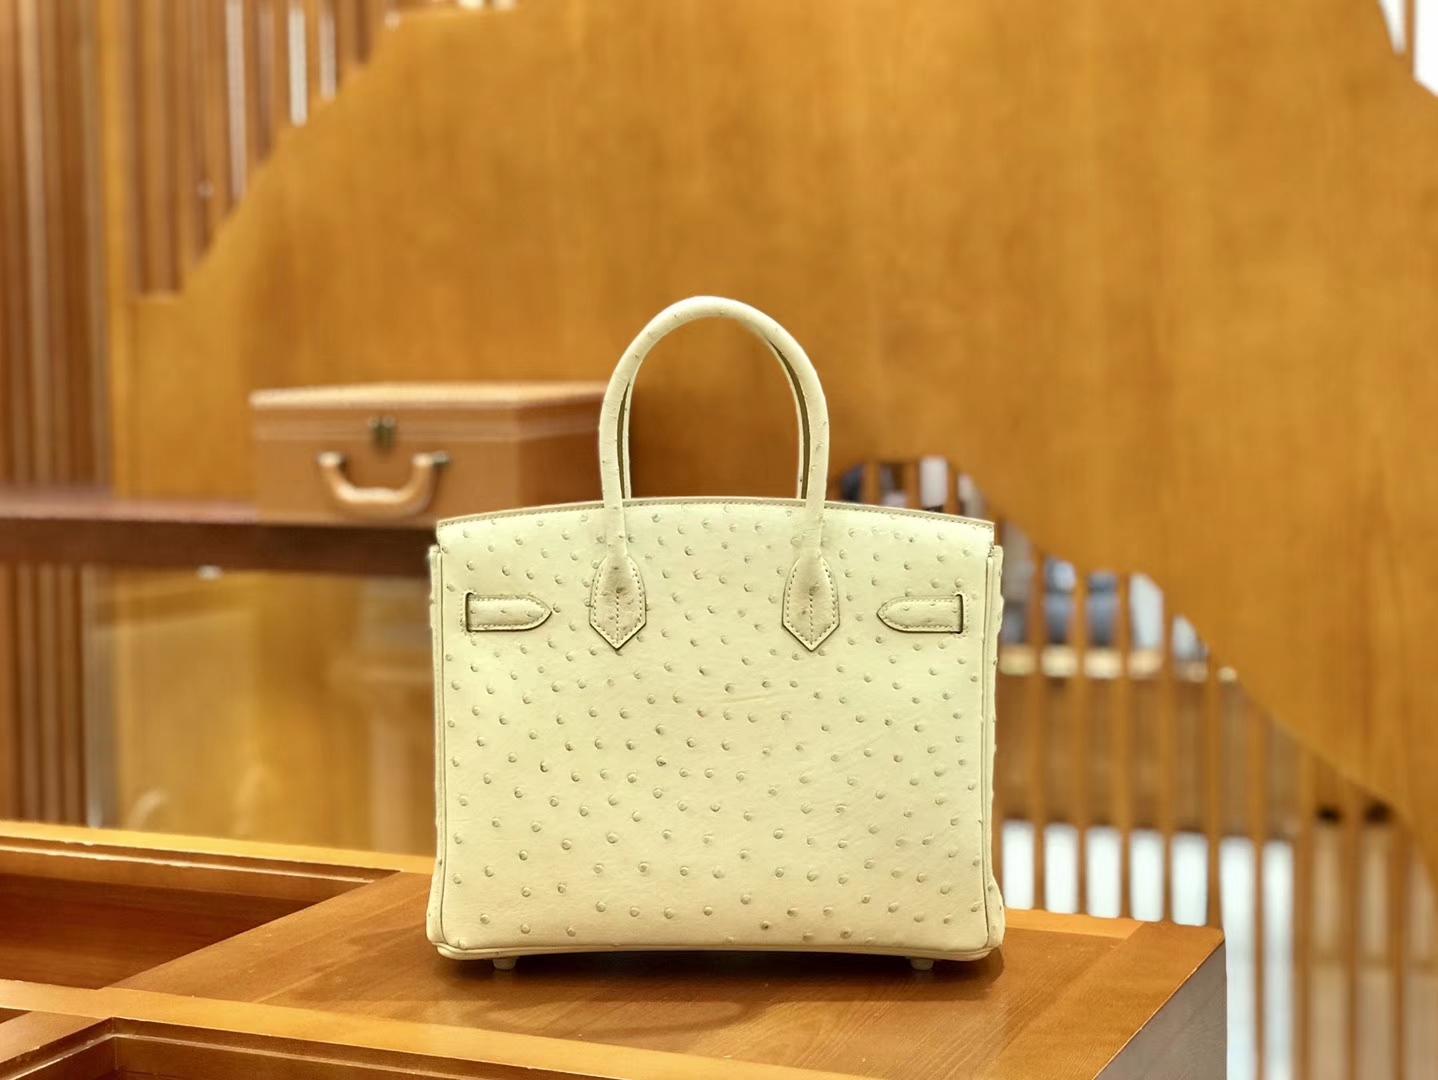 Hermès(爱马仕)Birkin 30cm 羊毛白 奶昔白 金扣 鸵鸟皮 全手工缝制